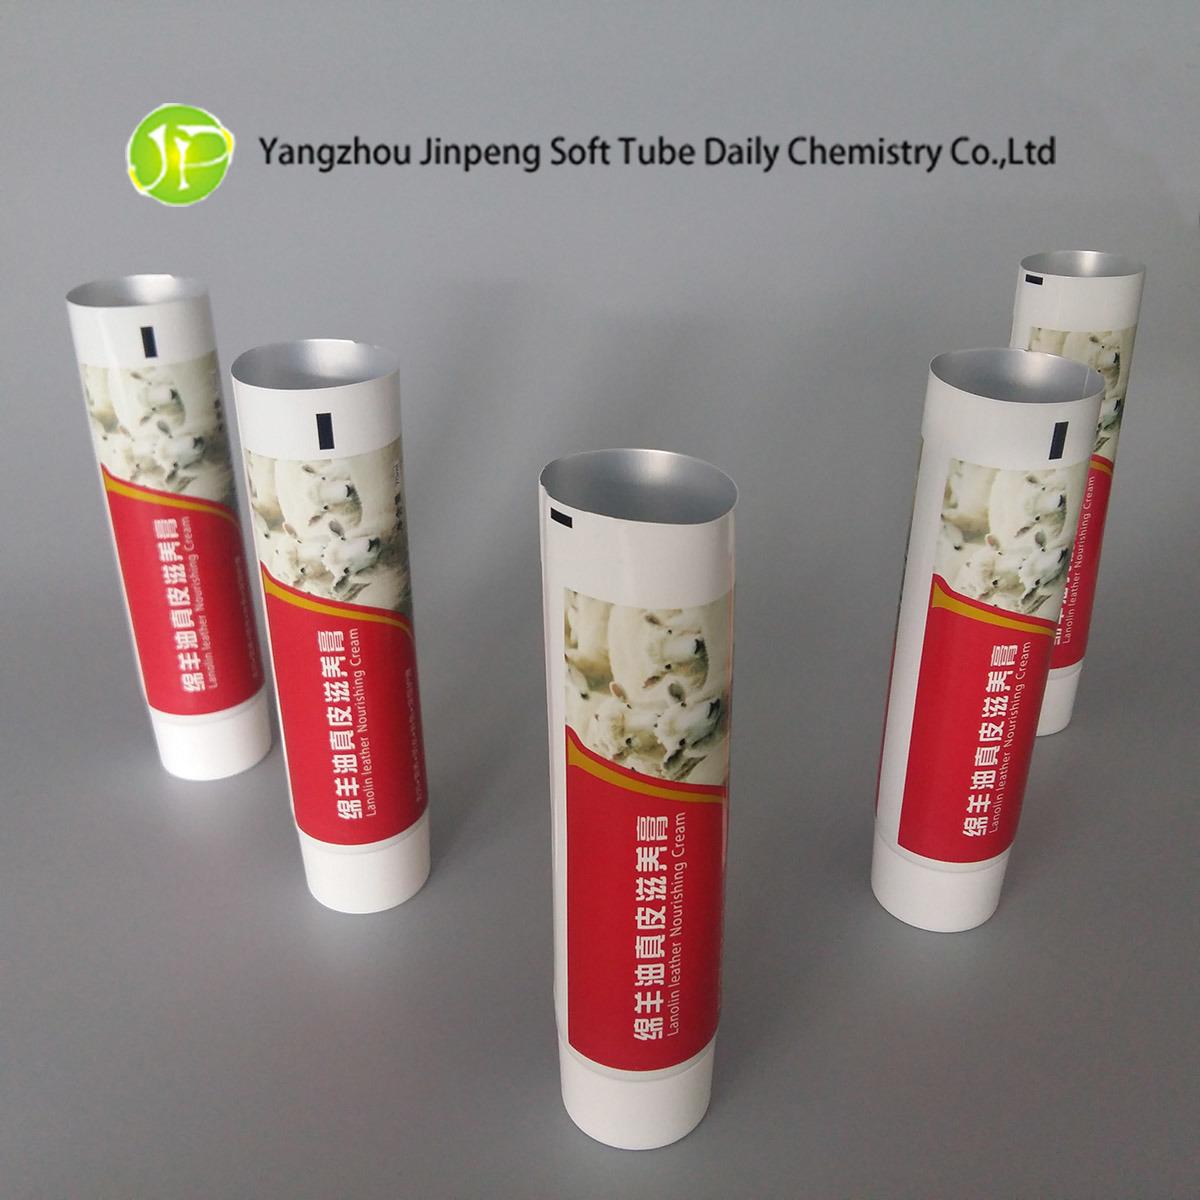 Aluminium&Plastic Cosmetic Packaging Tubes Leather Nourishing Cream Tubes Abl Tubes Pbl Tubes